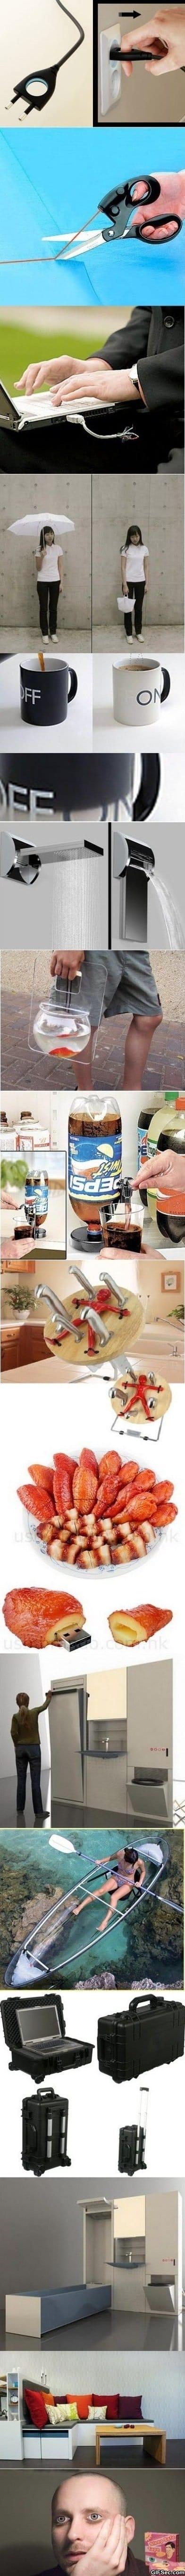 crazy-inventions